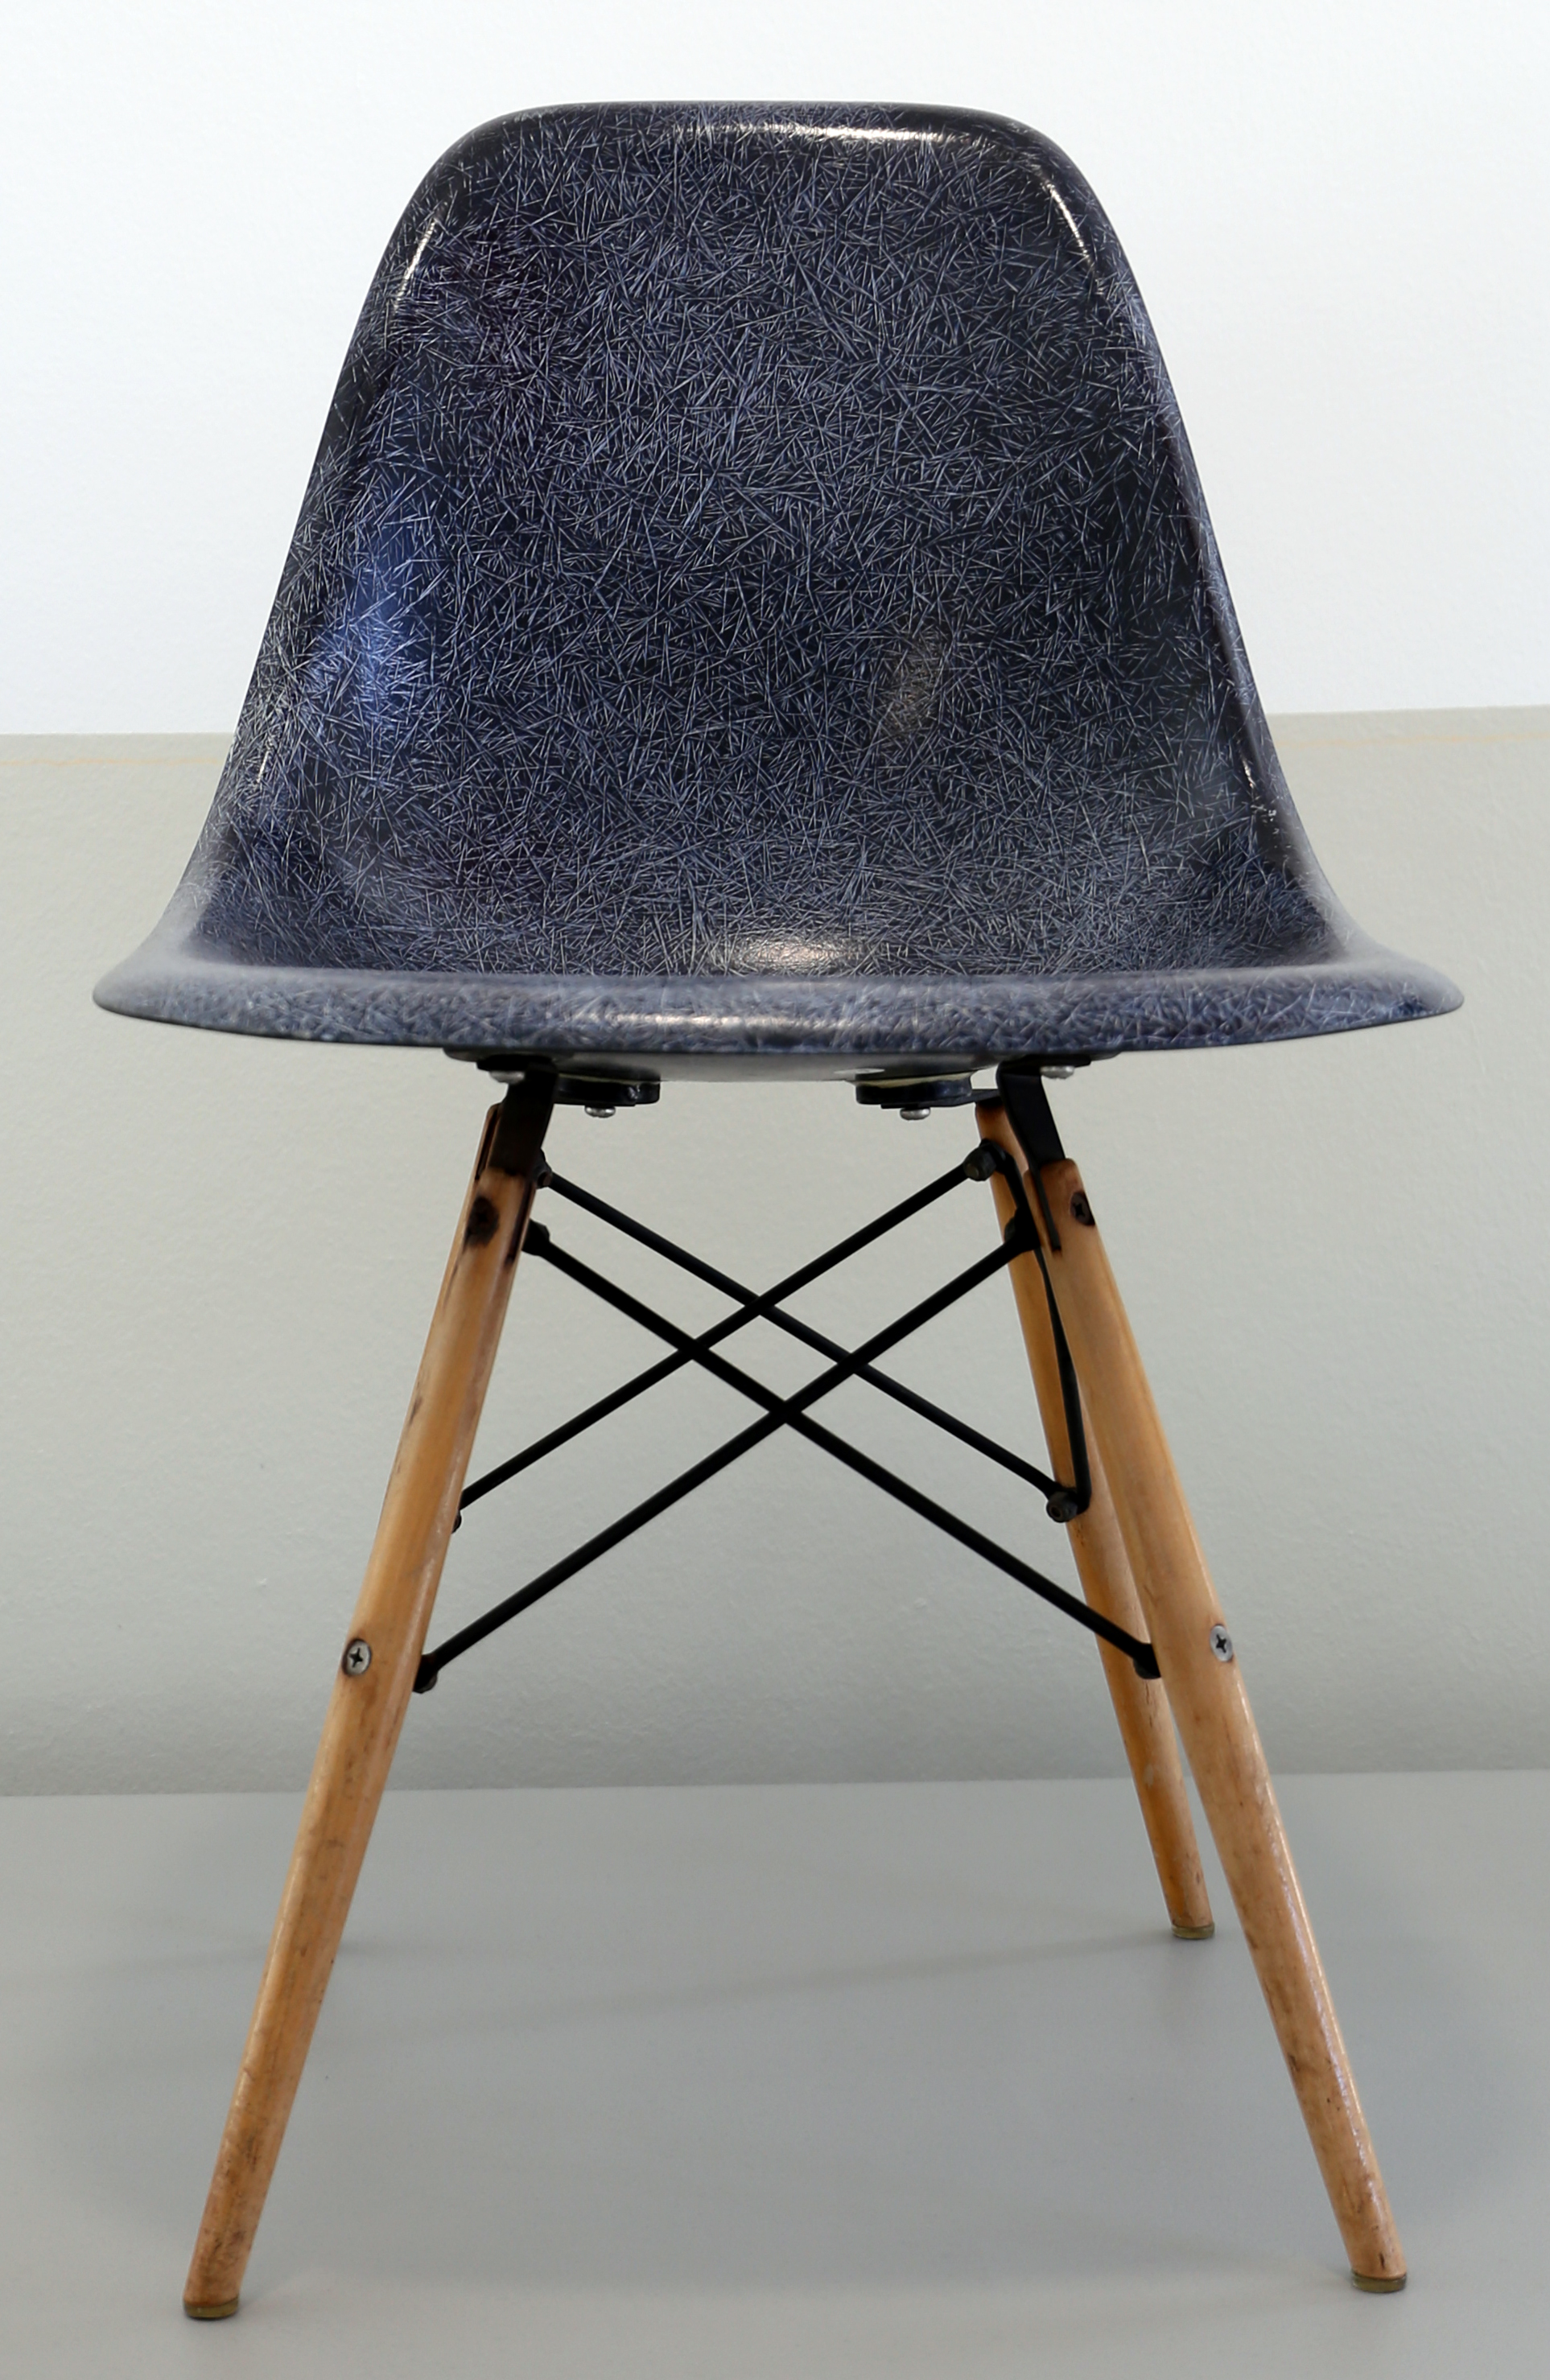 File:Charles eames per herman miller furniture, sedia bucket ...